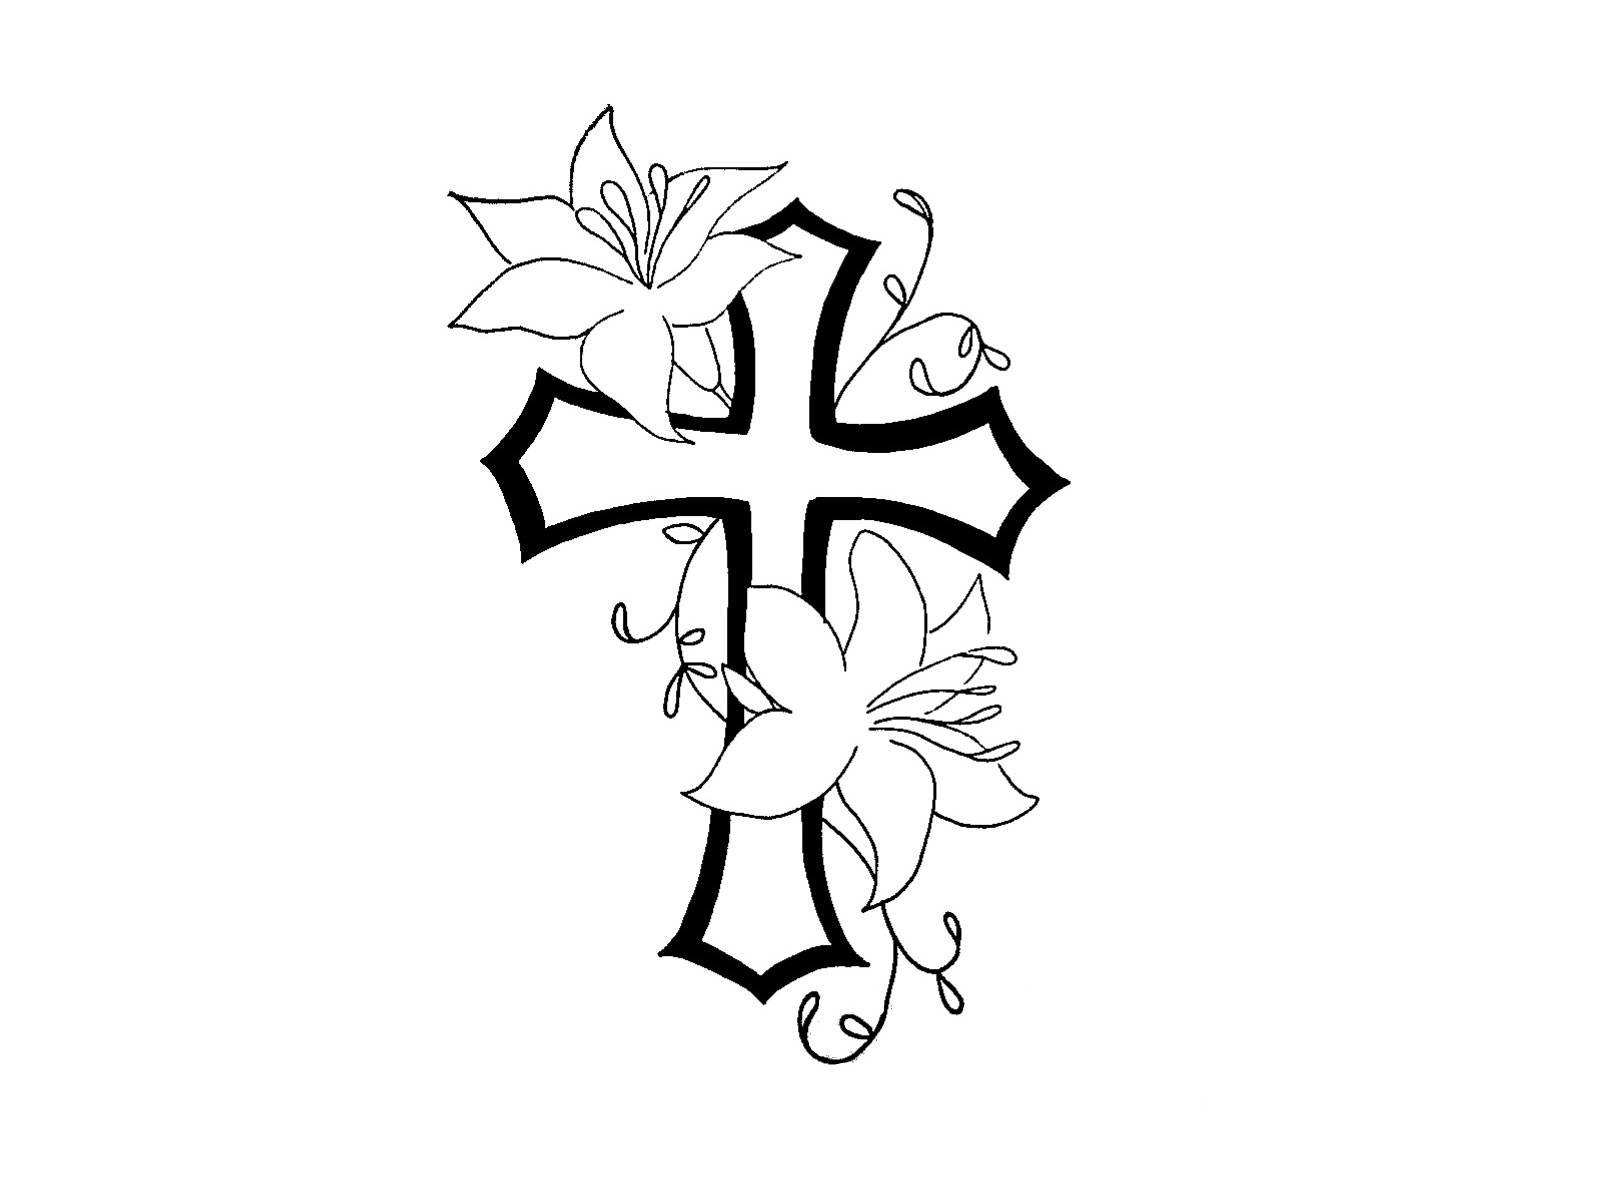 1600x1200 Drawn Vine Crosses